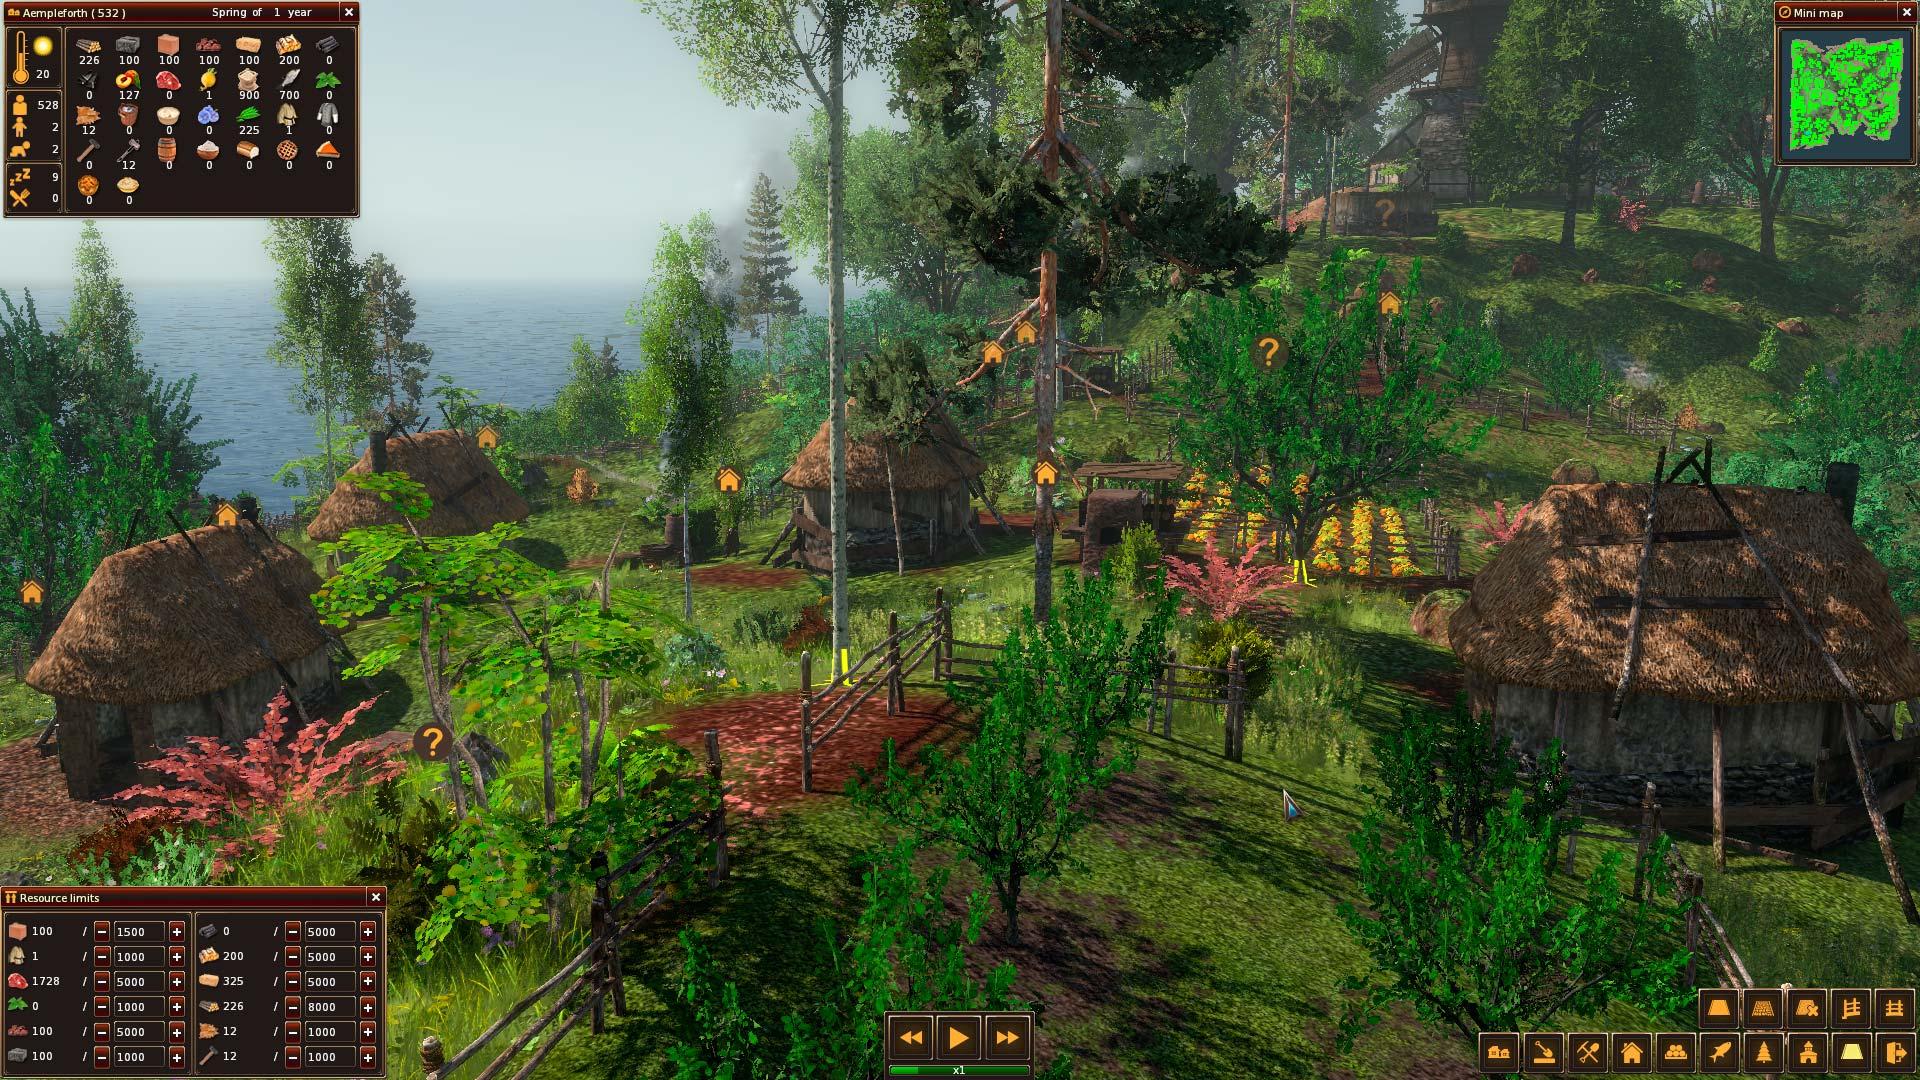 Life is feudal forest village цель игры ролевая игра катастрофа пустыне